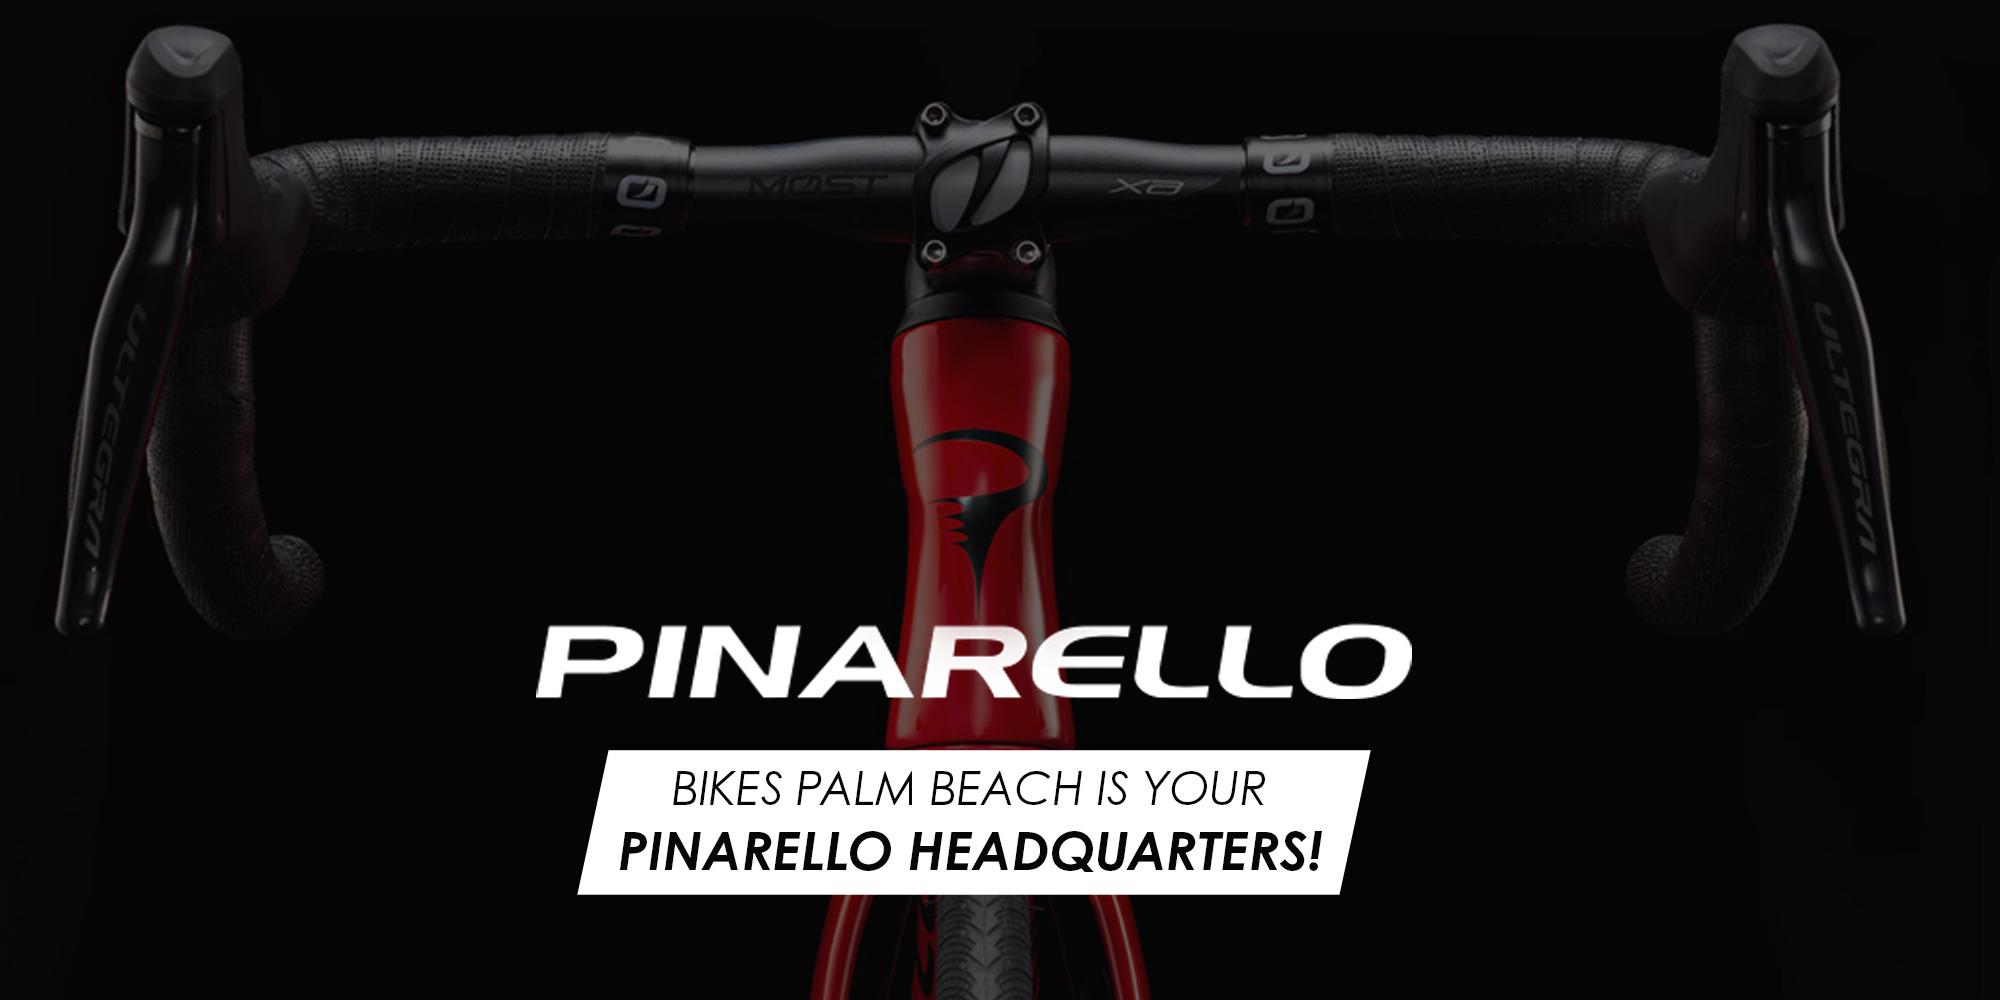 Bikes Palm Beach is your Pinarello Headquarters